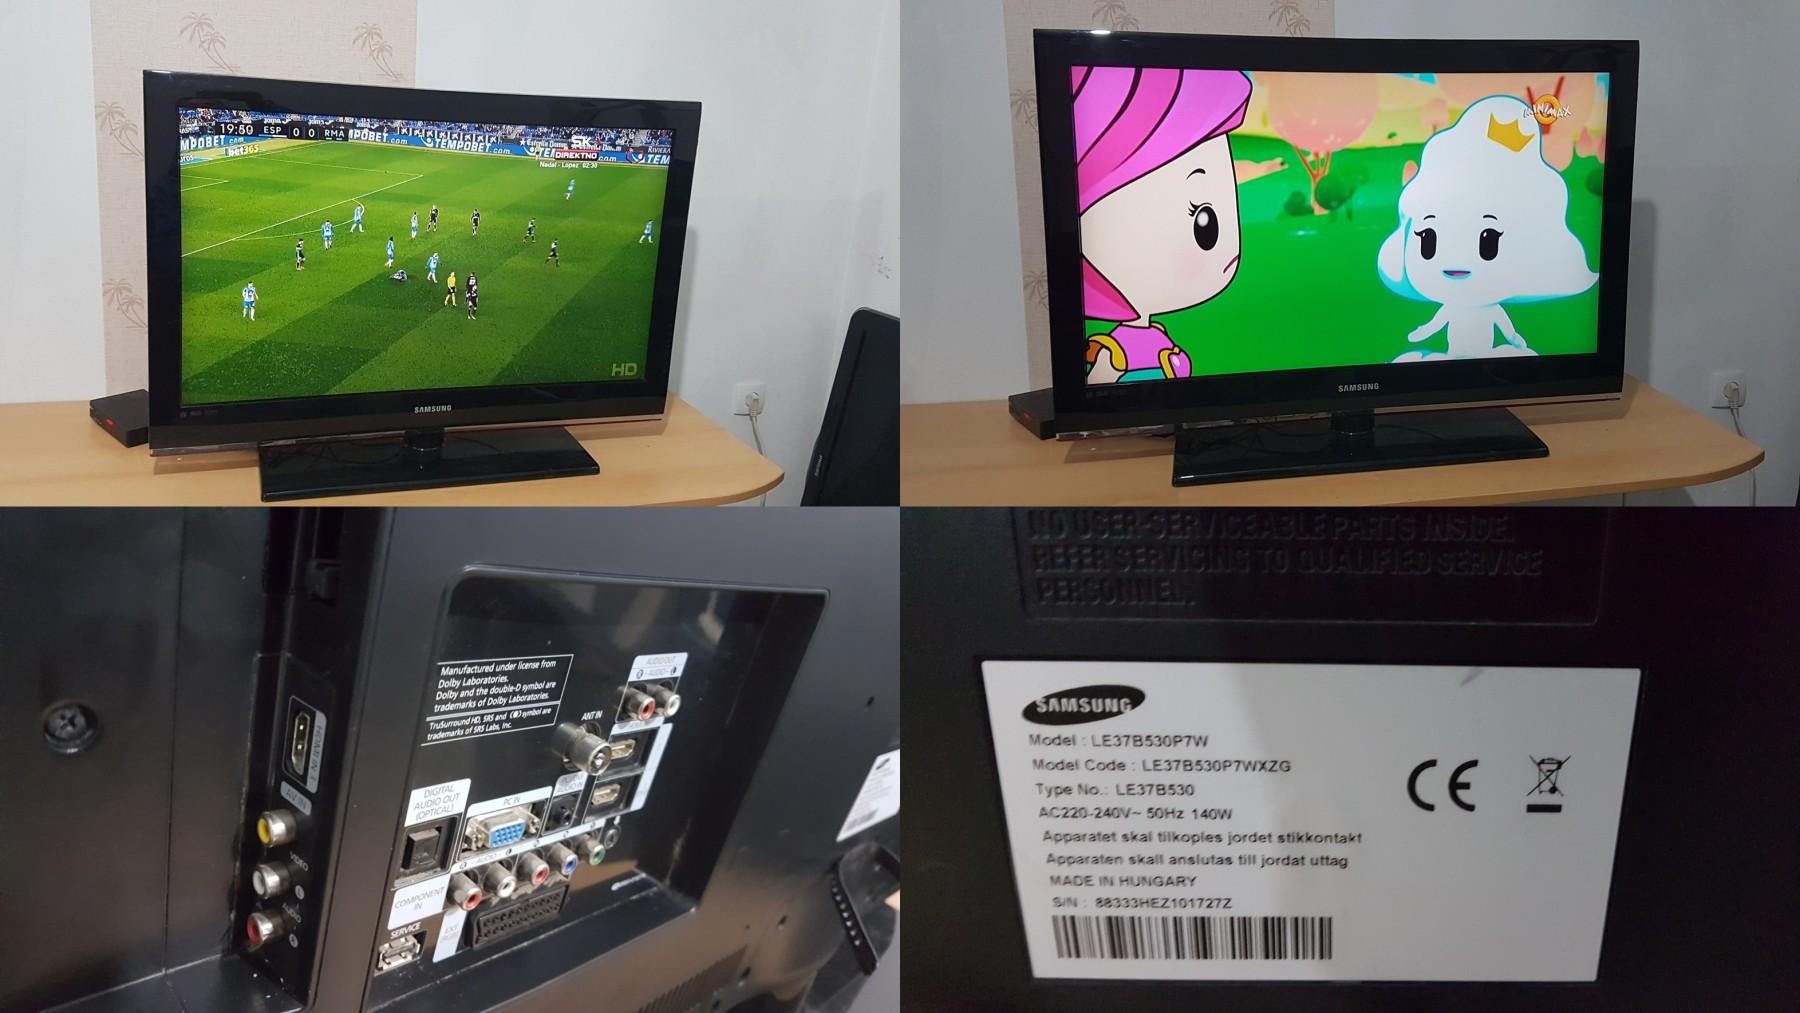 los angeles 1cace 41b1b LCD tv SAMSUNG 37 inca FULL HD,hdmi